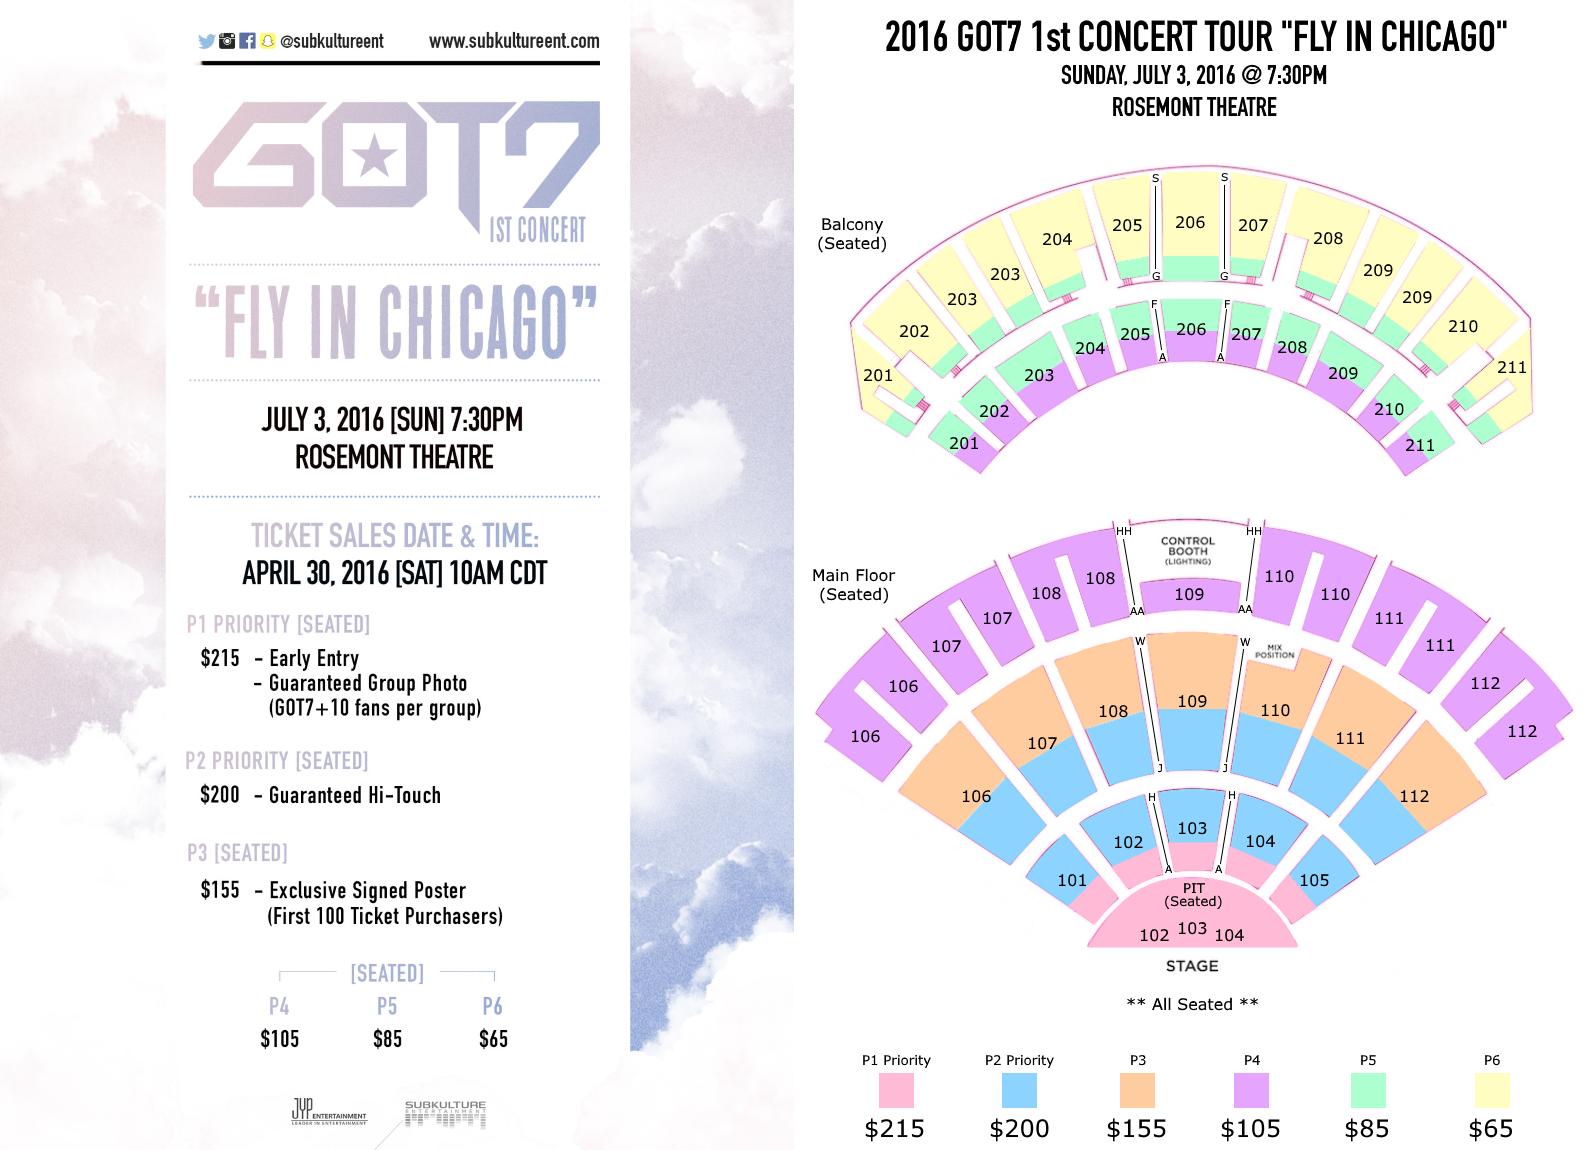 2016 got7 1st concert tour  u201cfly in usa u201d ticket pricing  u0026 information  u2013 hypnoticasia